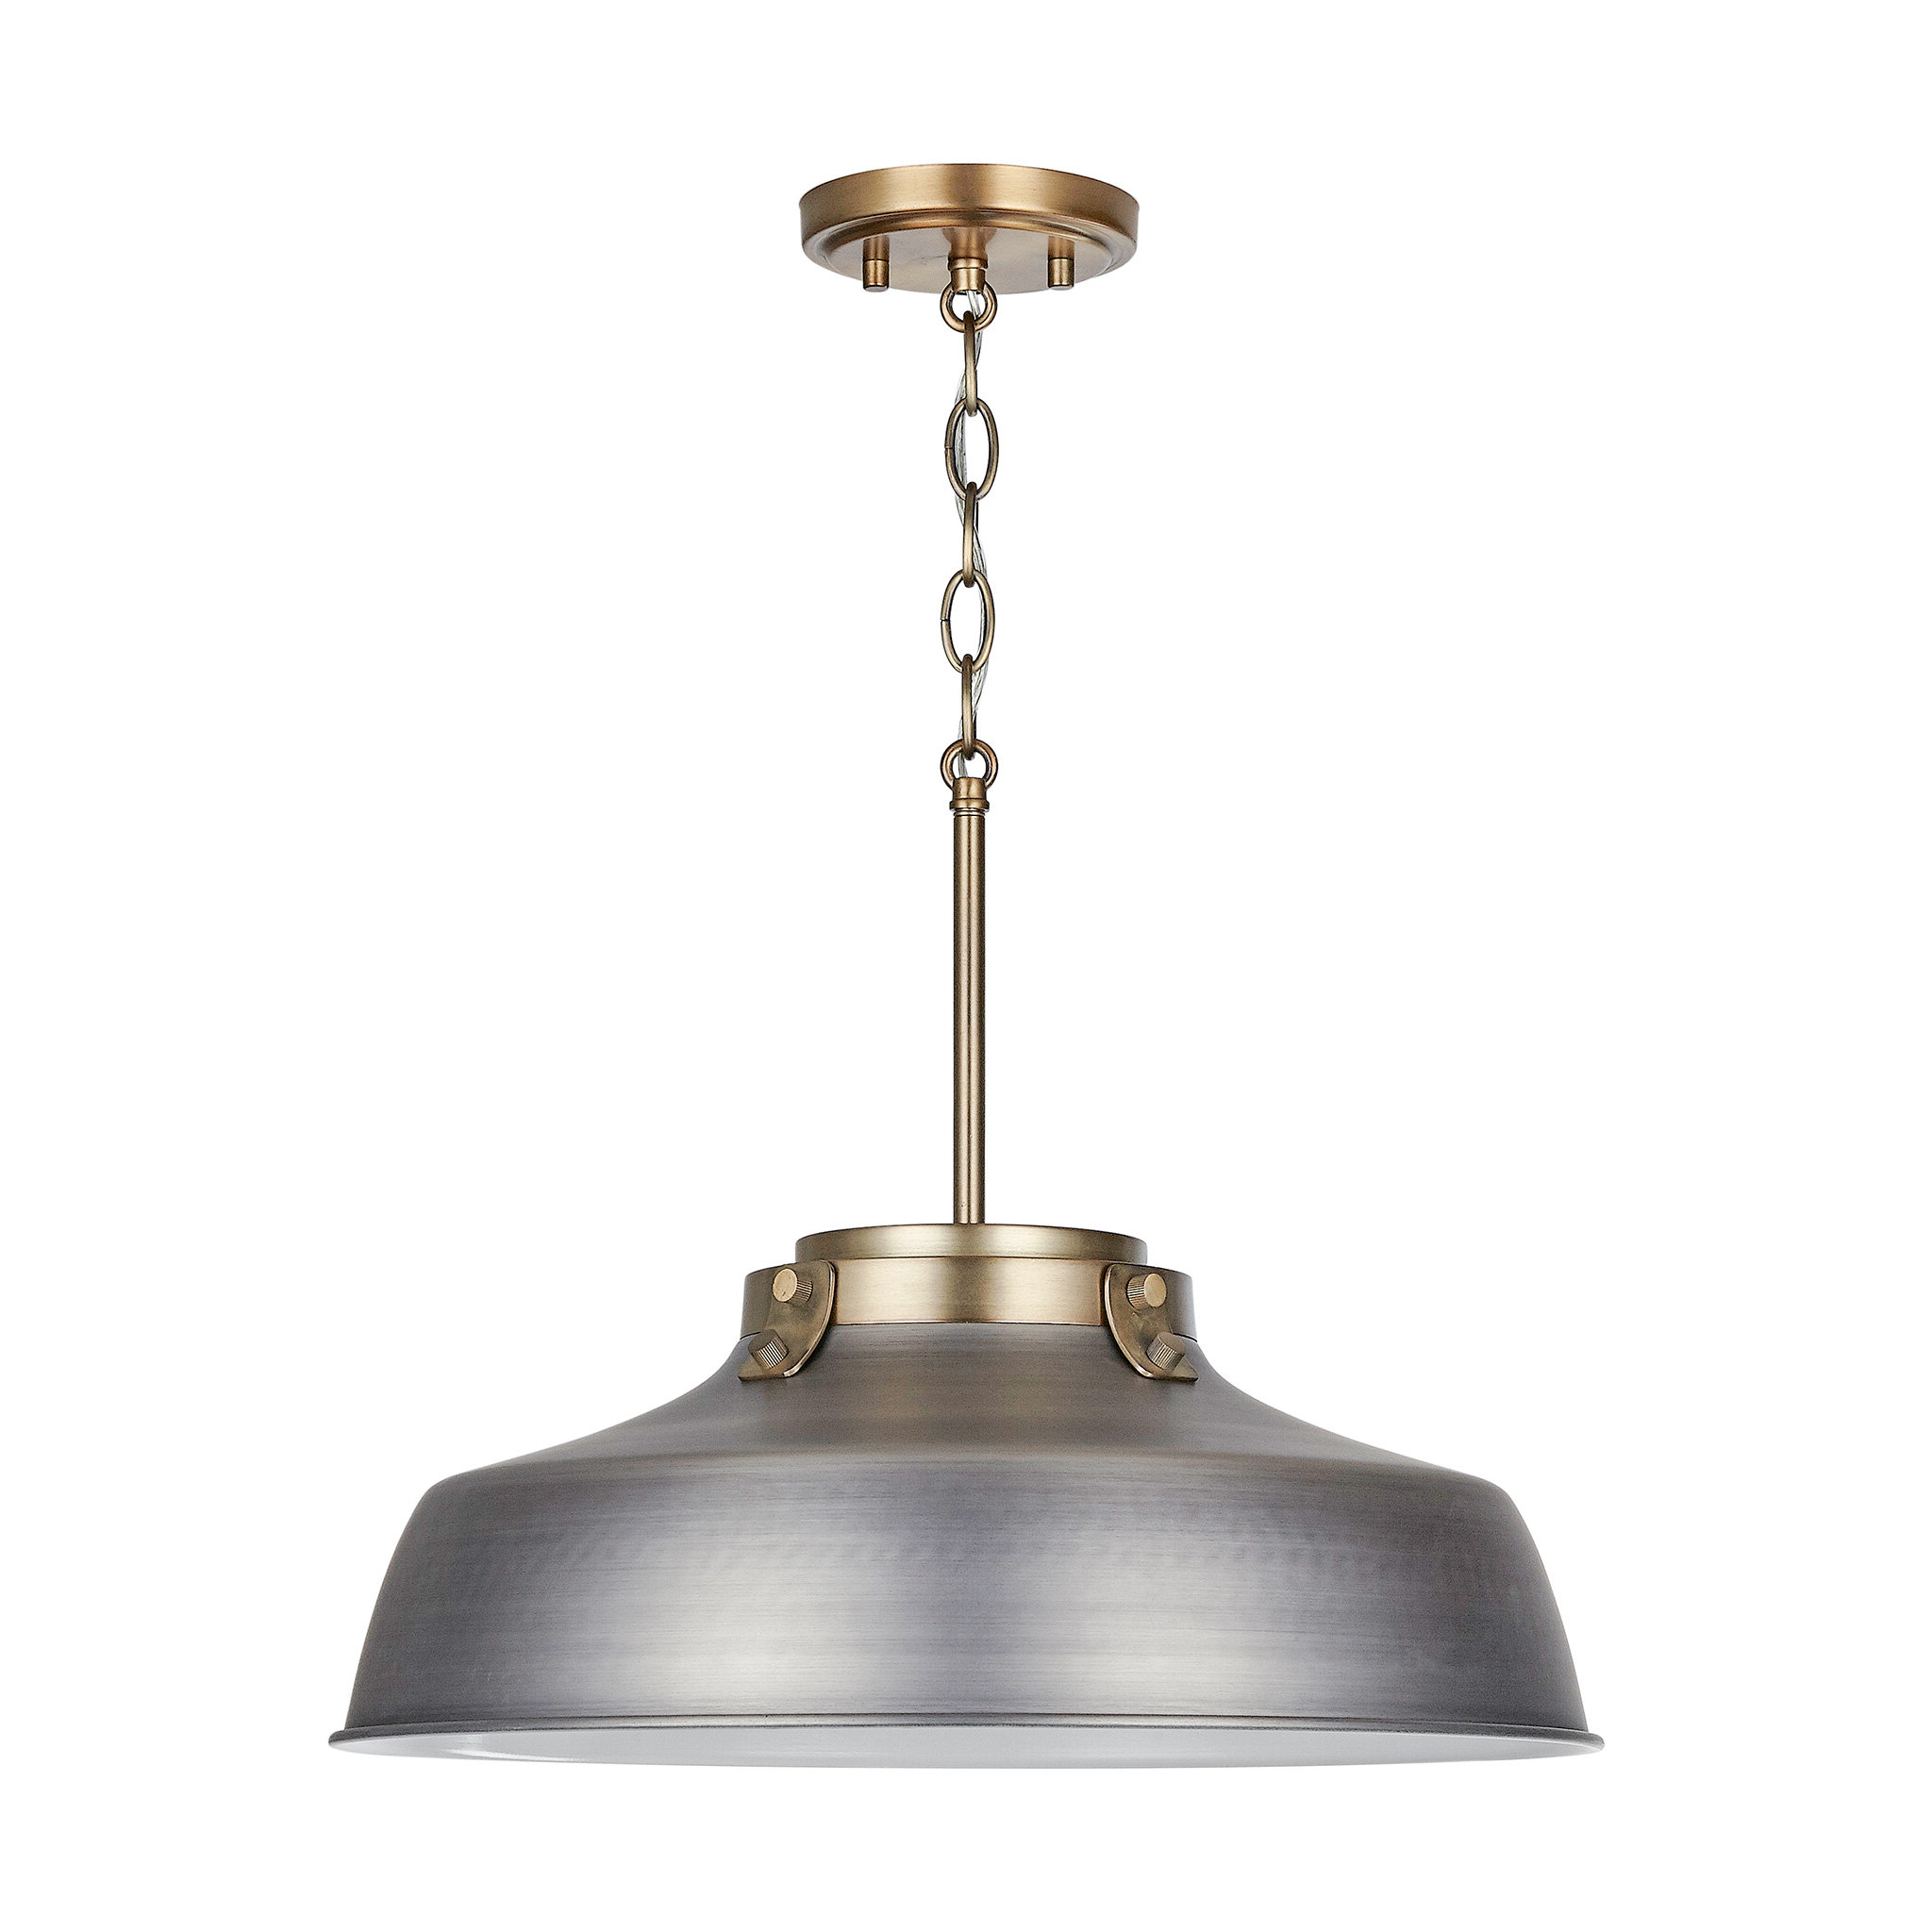 2020 Knoxville 1 Light Single Teardrop Pendants Inside 1 Light Single Dome Pendant (View 3 of 25)